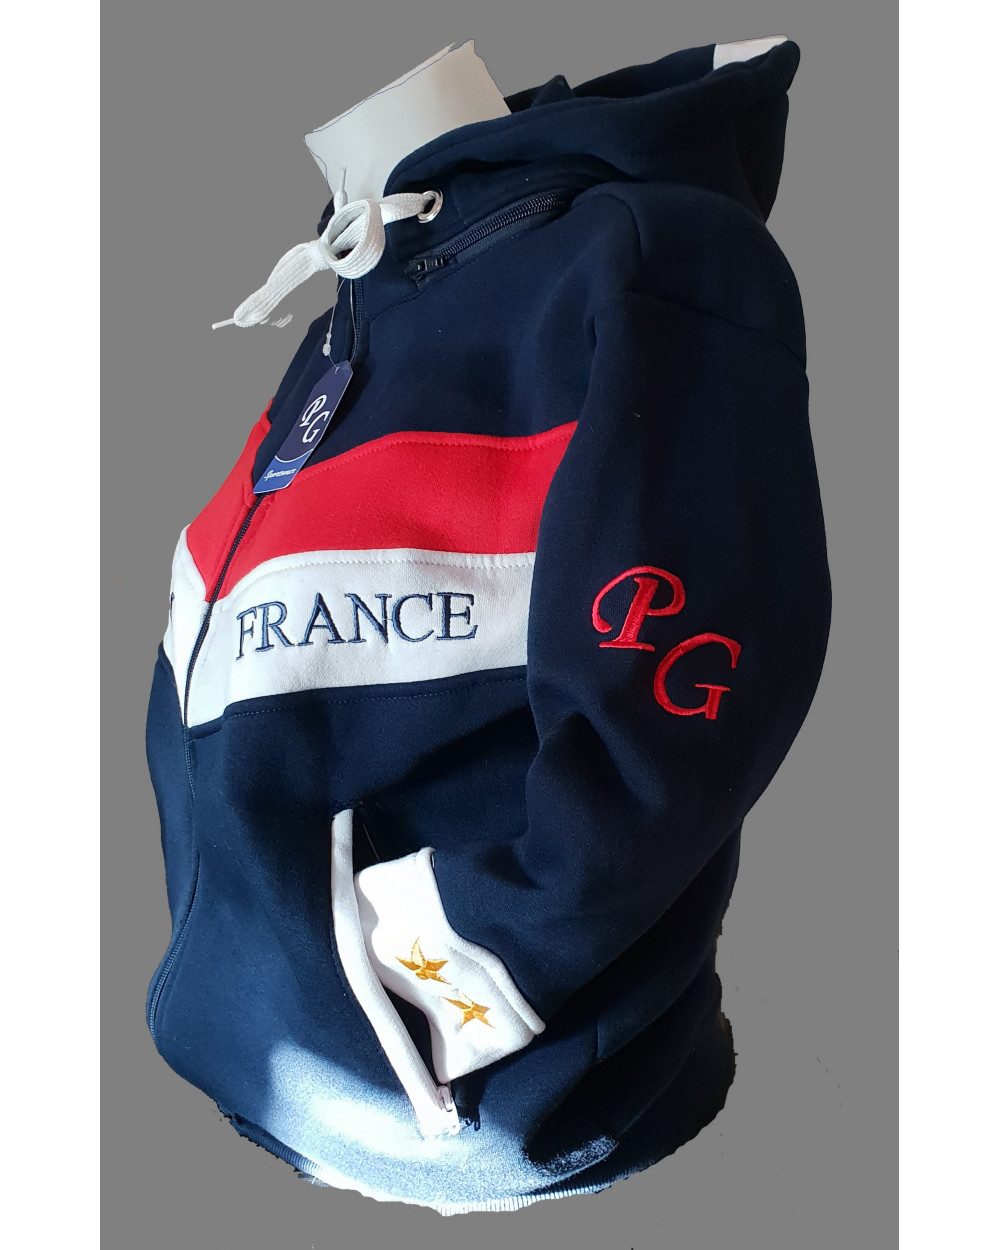 Sweat France PG Zip